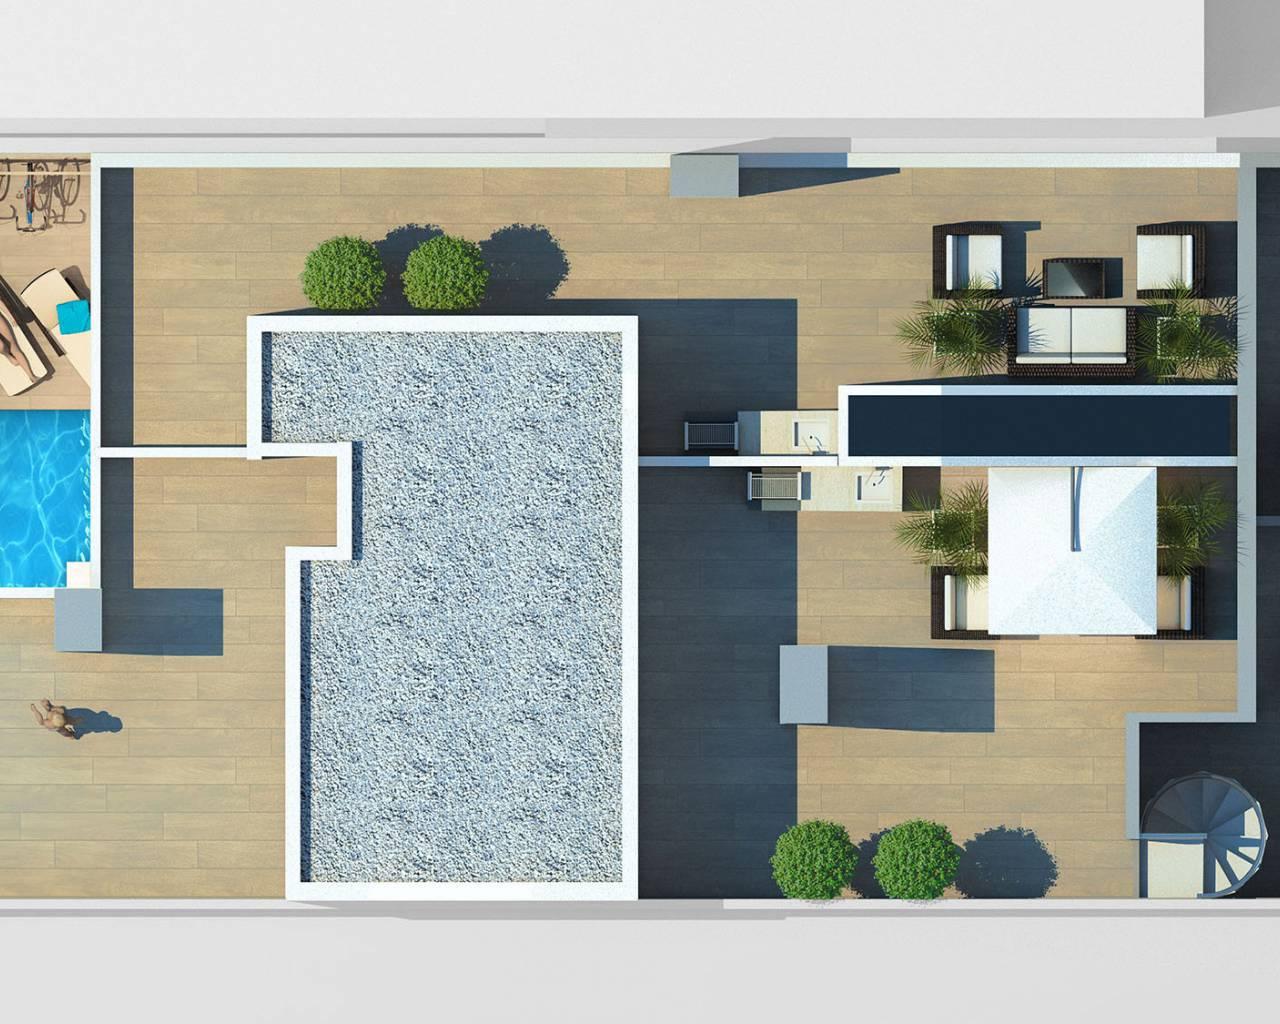 nieuwbouw-appartement-torrevieja-centrum-torrevieja_2802_xl